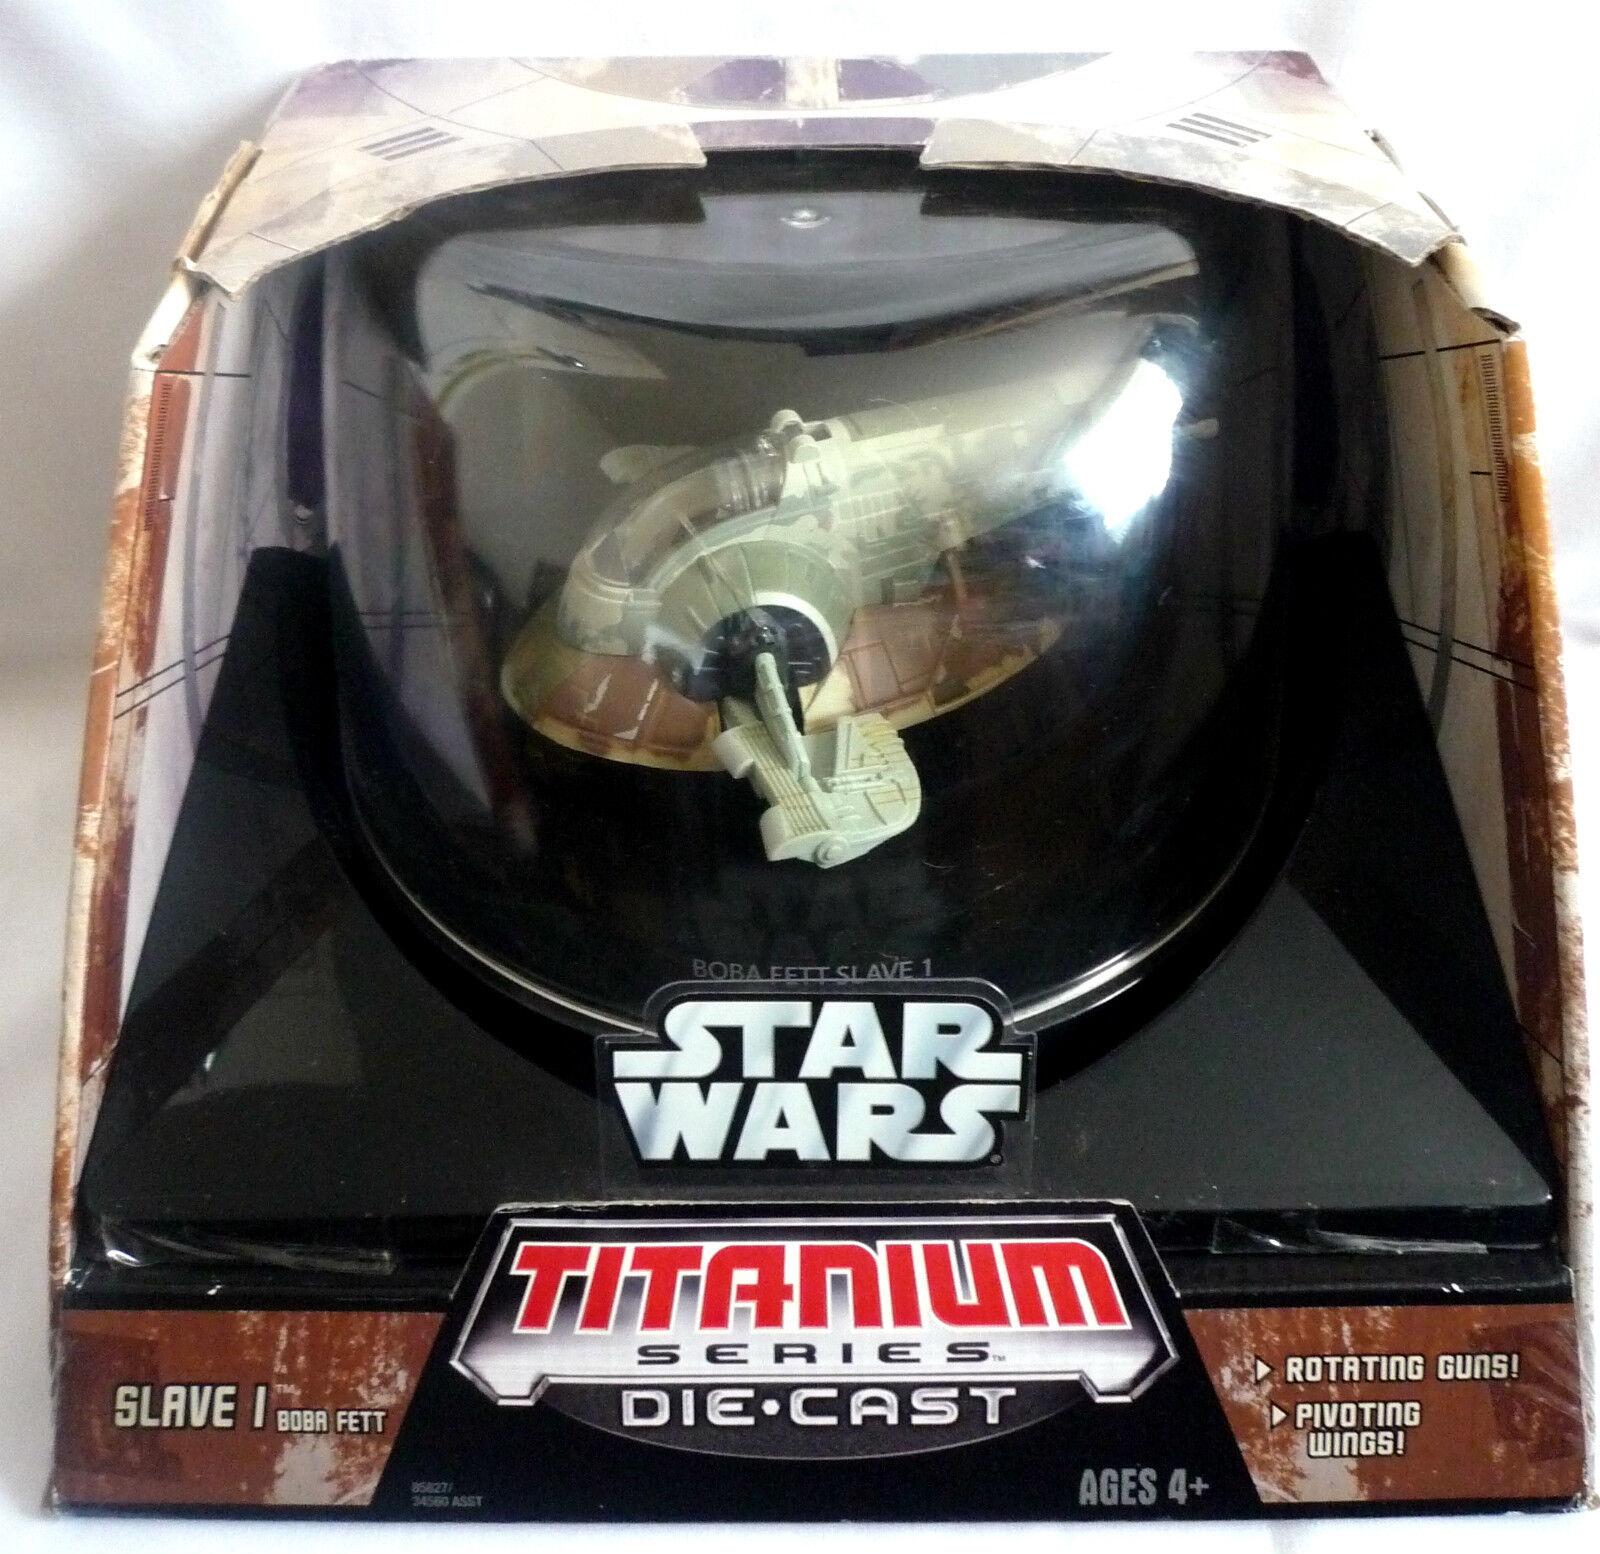 STAR WARS TITANIUM SERIES   DIE CAST BOBA FETT FETT FETT SLAVE 1   NEW WITH BOX adbdb7